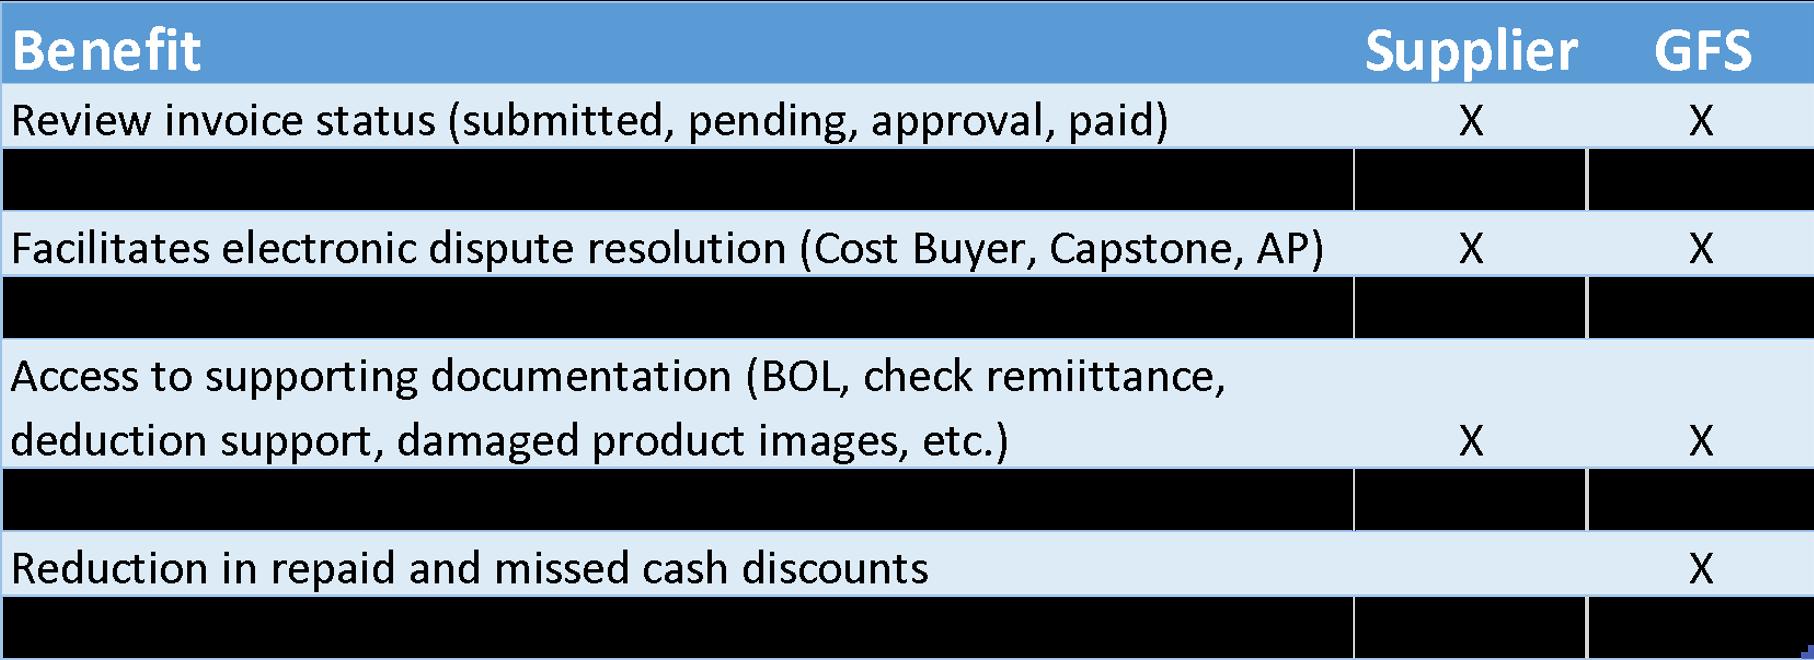 Benefits_GFS